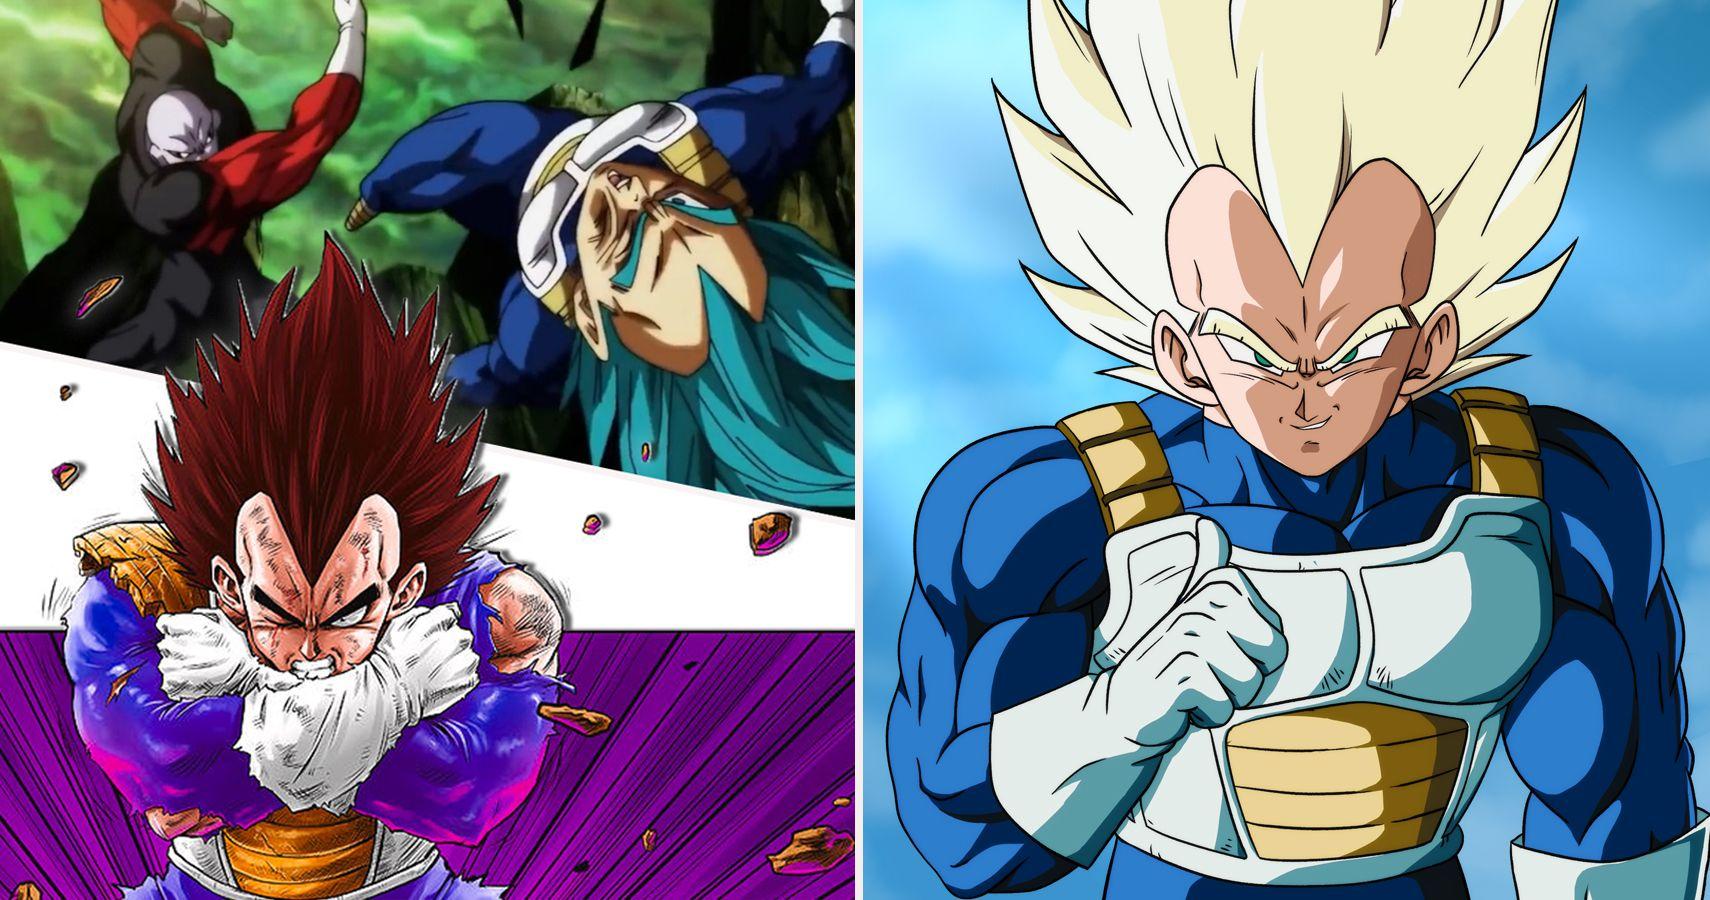 Dragon Ball 15 Characters Stronger Than Vegeta And 15 Strange Ones